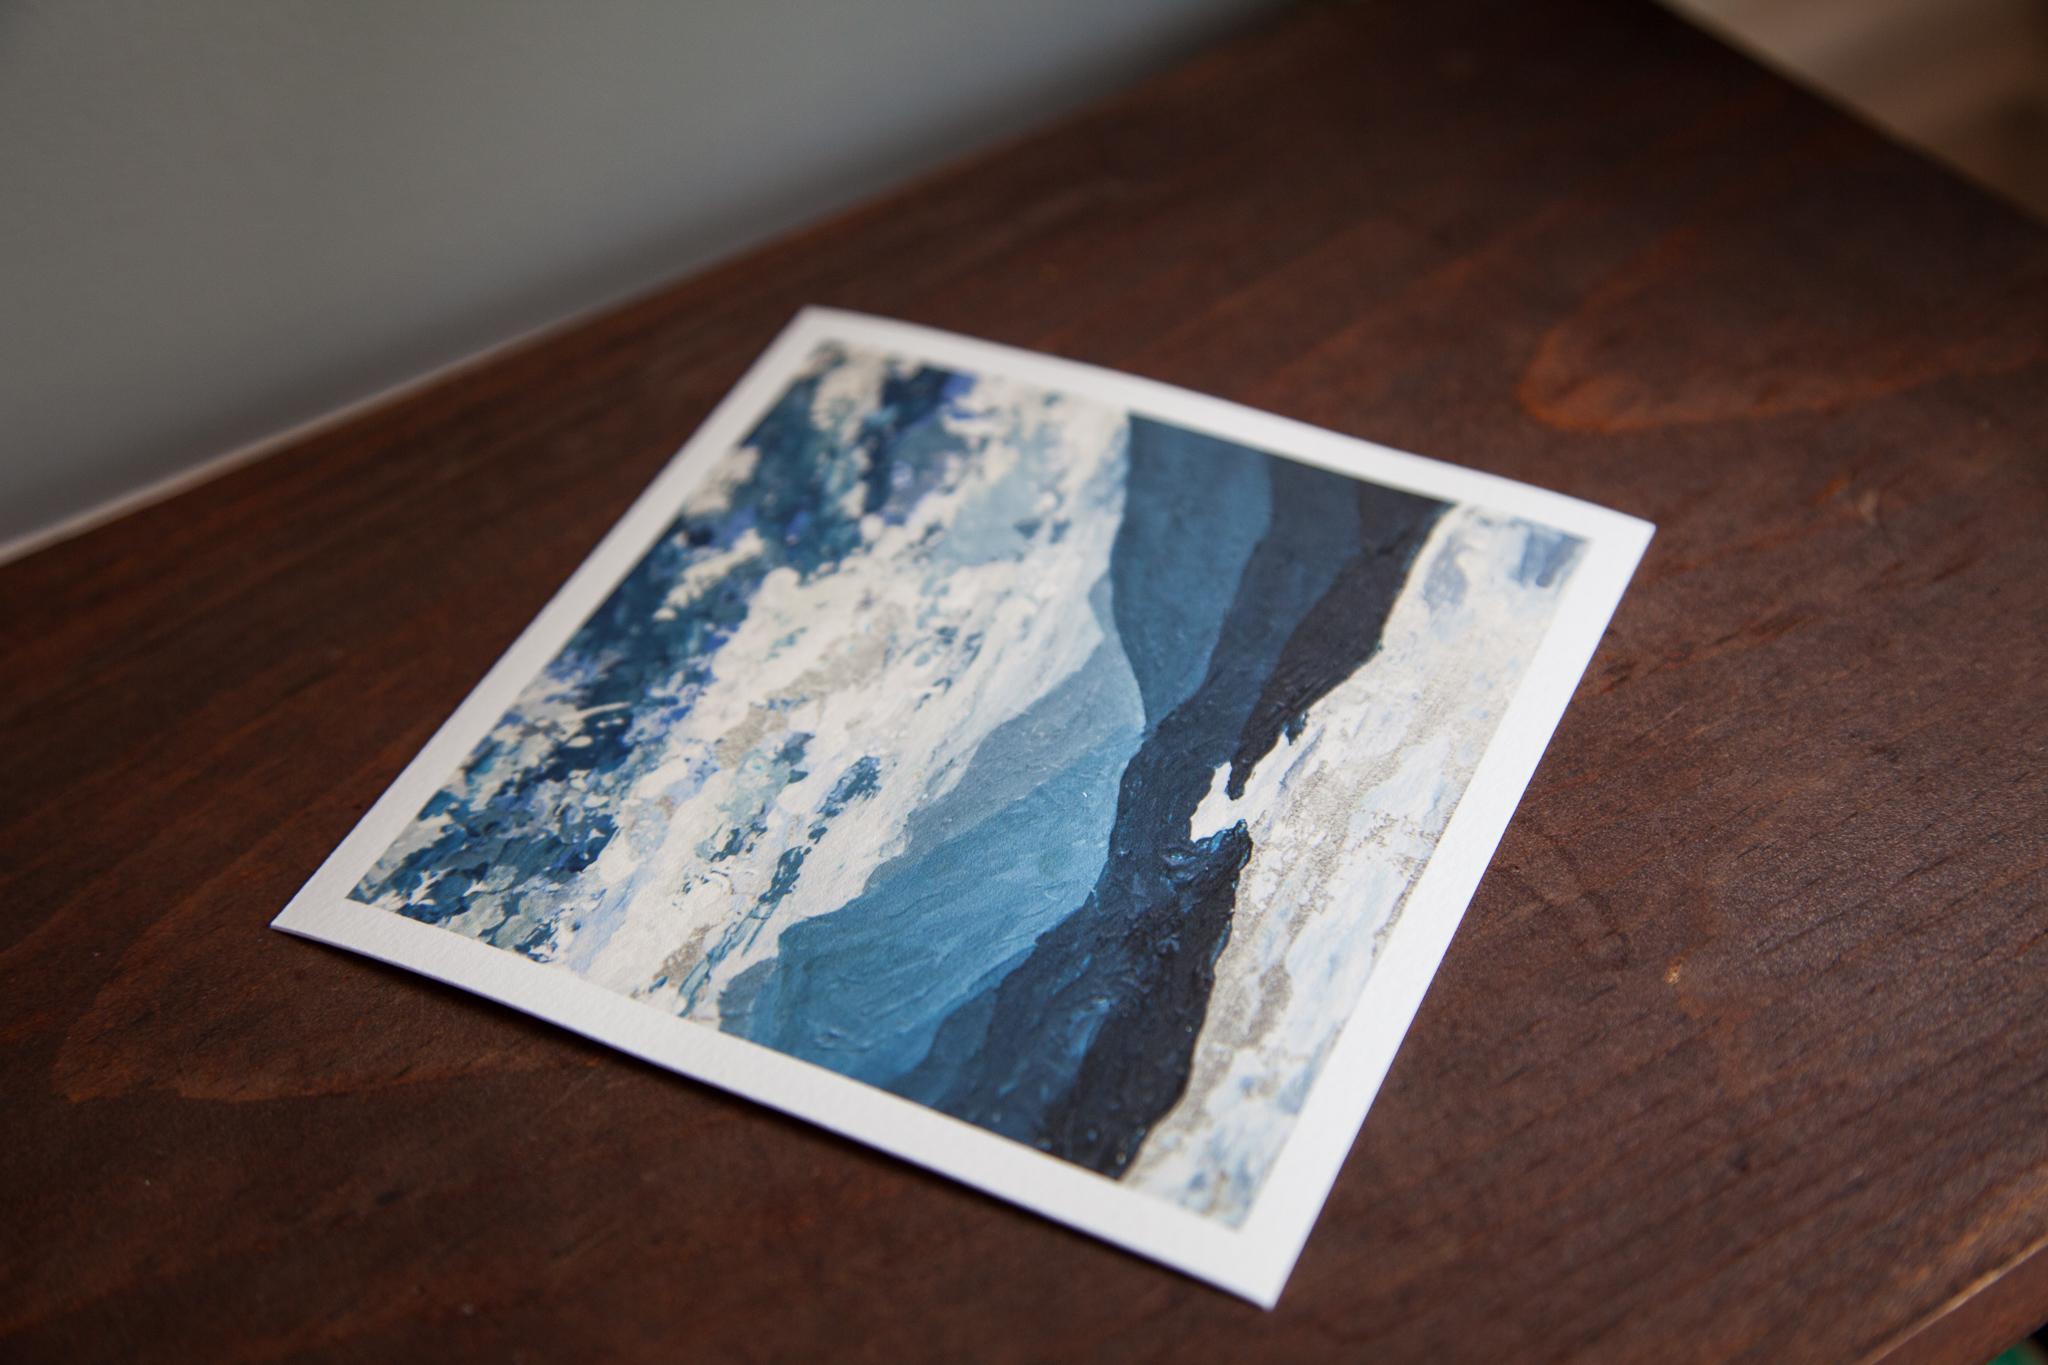 larkspur-and-laurel-print-6.jpg